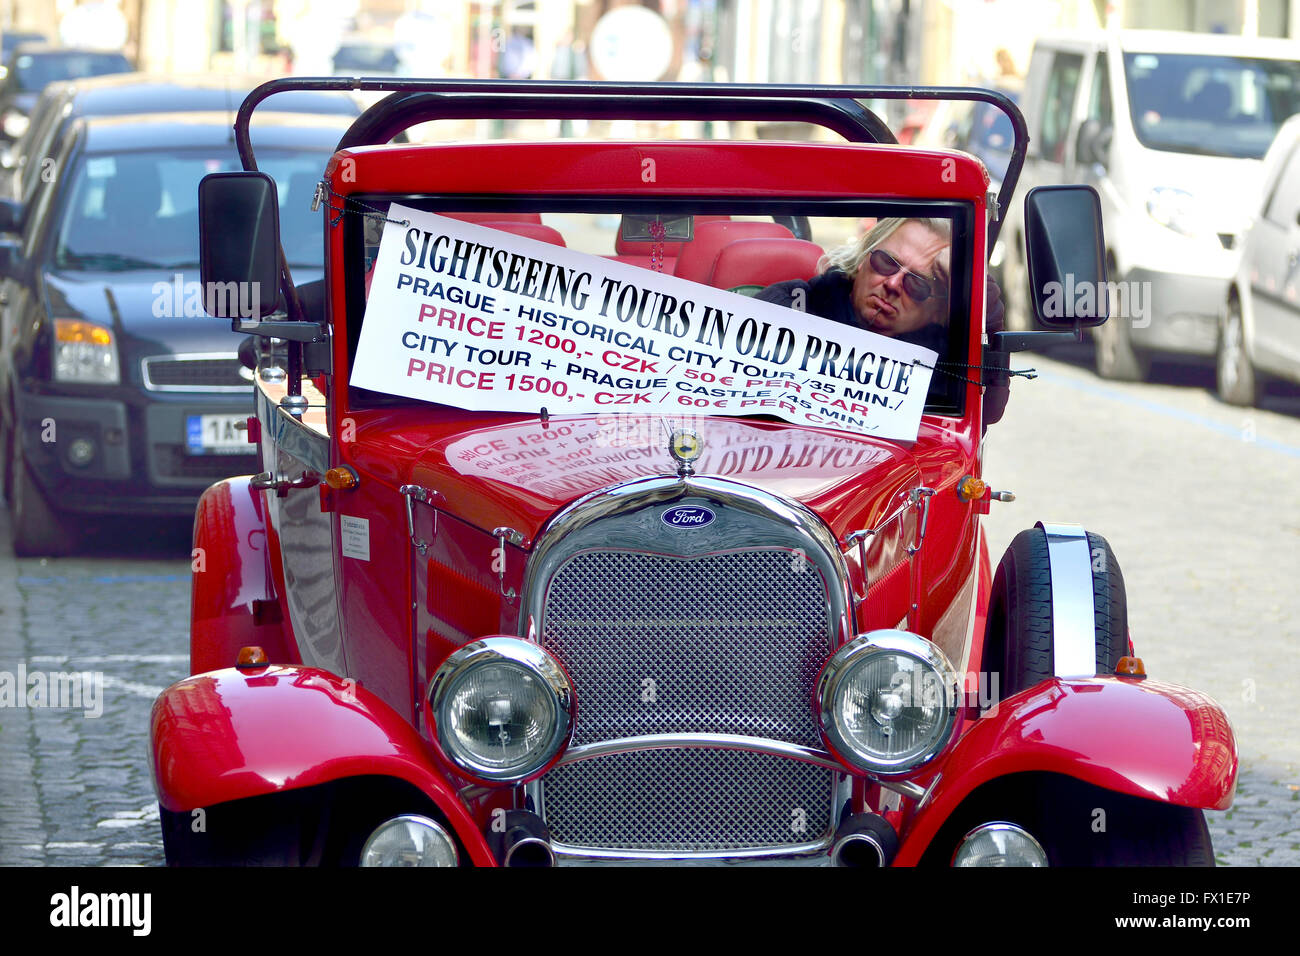 Prague Vintage Car Stock Photos & Prague Vintage Car Stock Images ...